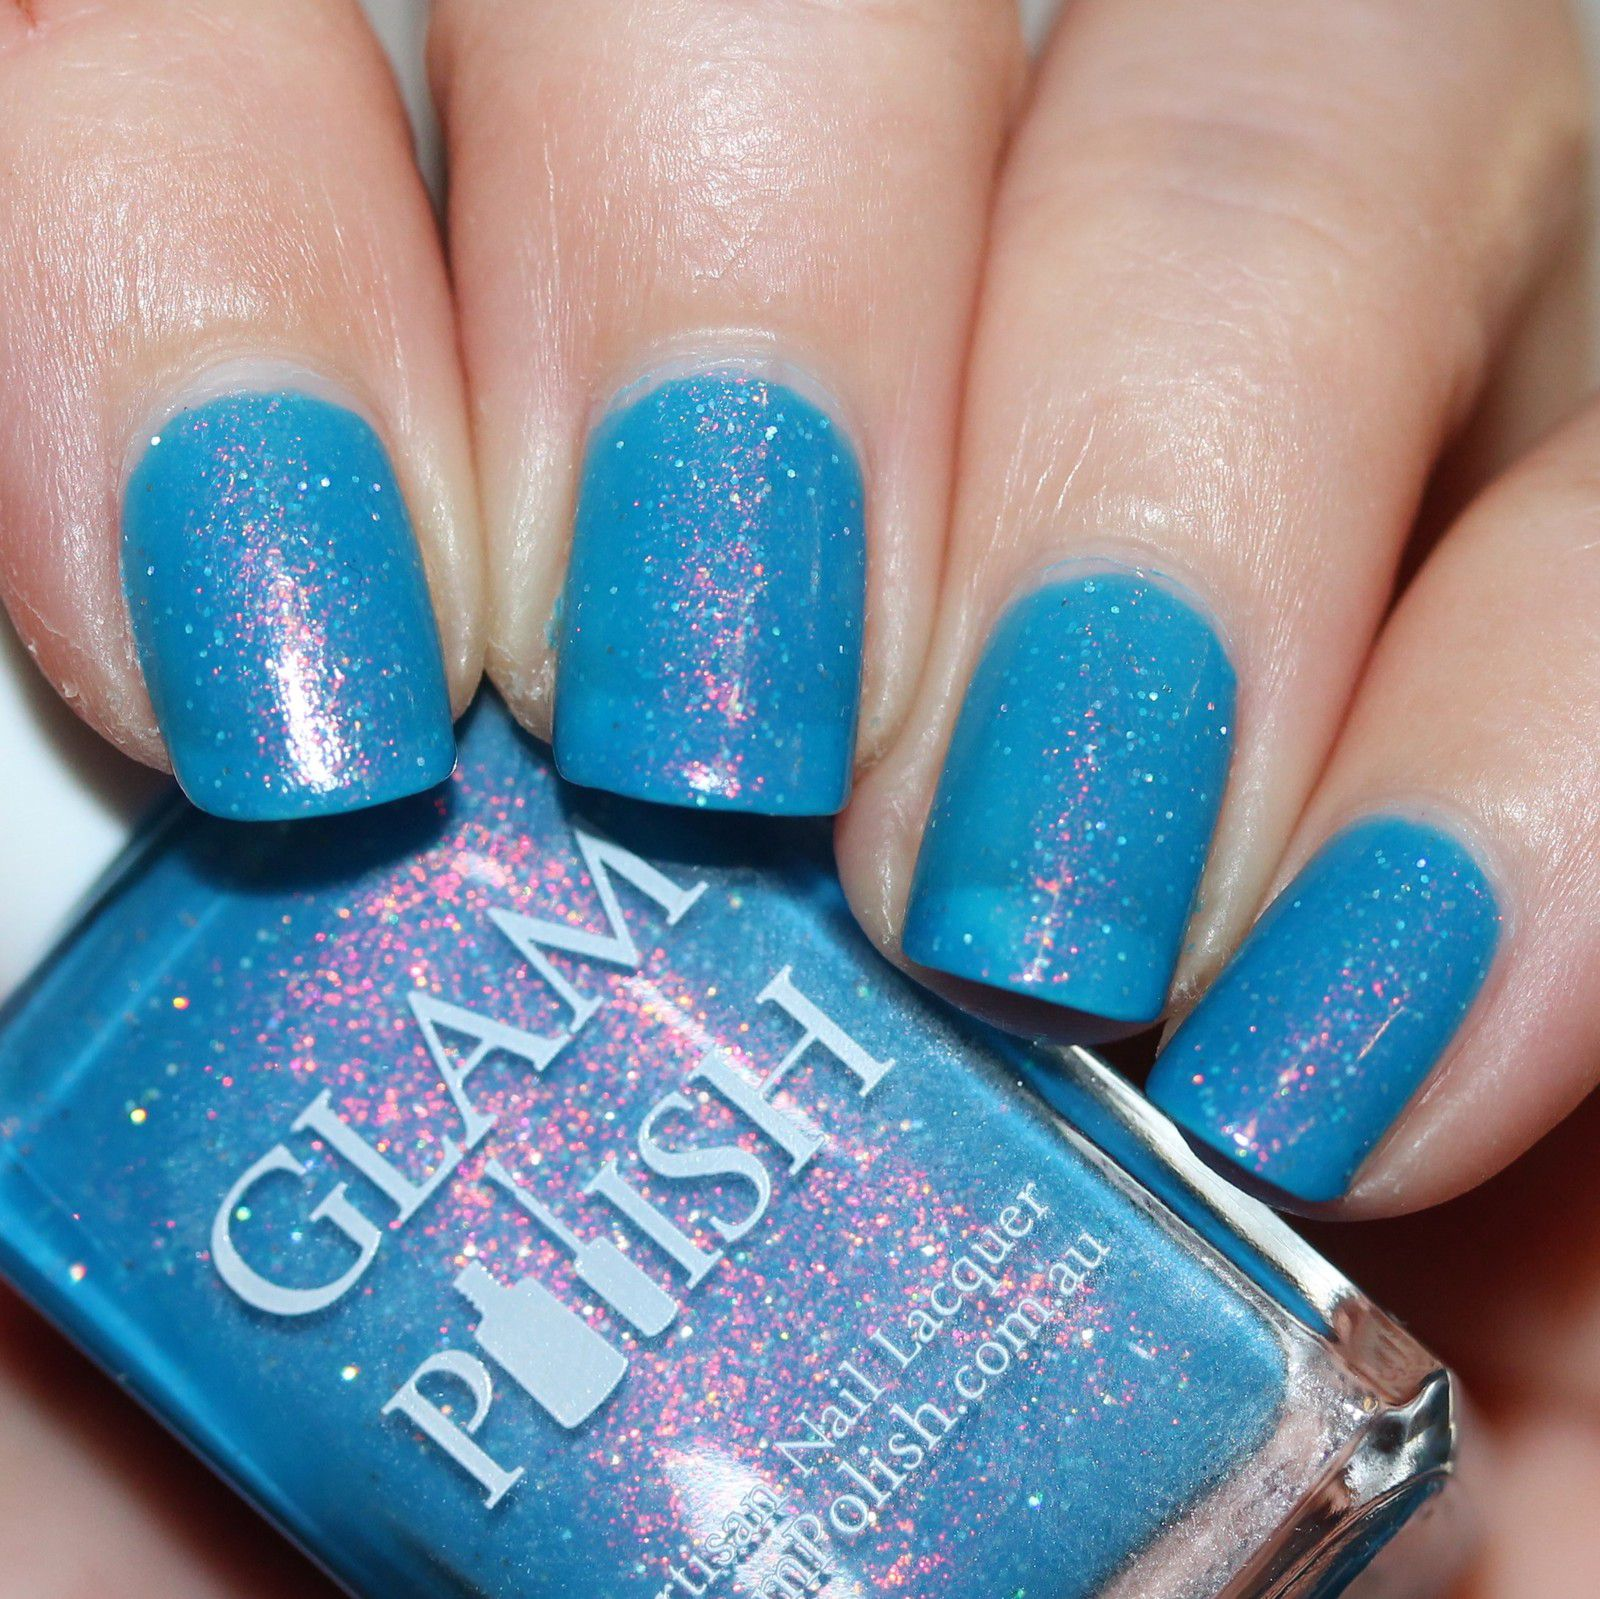 Essie Protein Base Coat / Glam polish Shattered Empire / Essie Gel Top Coat